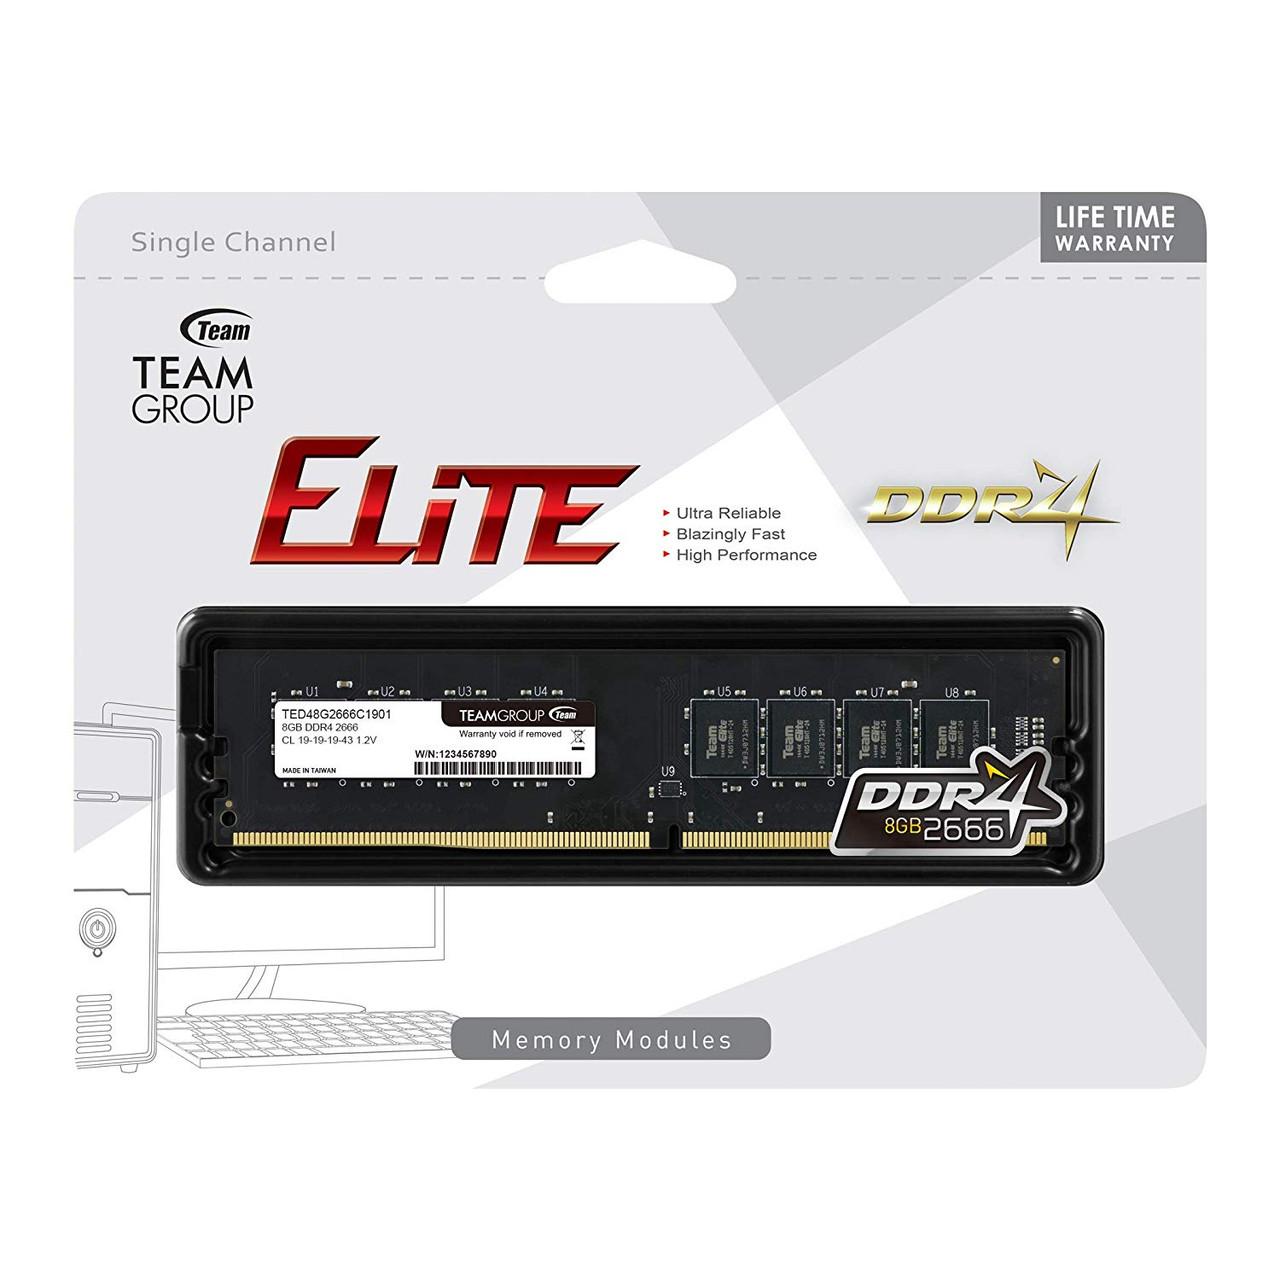 Strange Ram Team Elite 4Gb 8Gb 16Gb Ddr4 2666Mhz Desktop Memory Download Free Architecture Designs Scobabritishbridgeorg